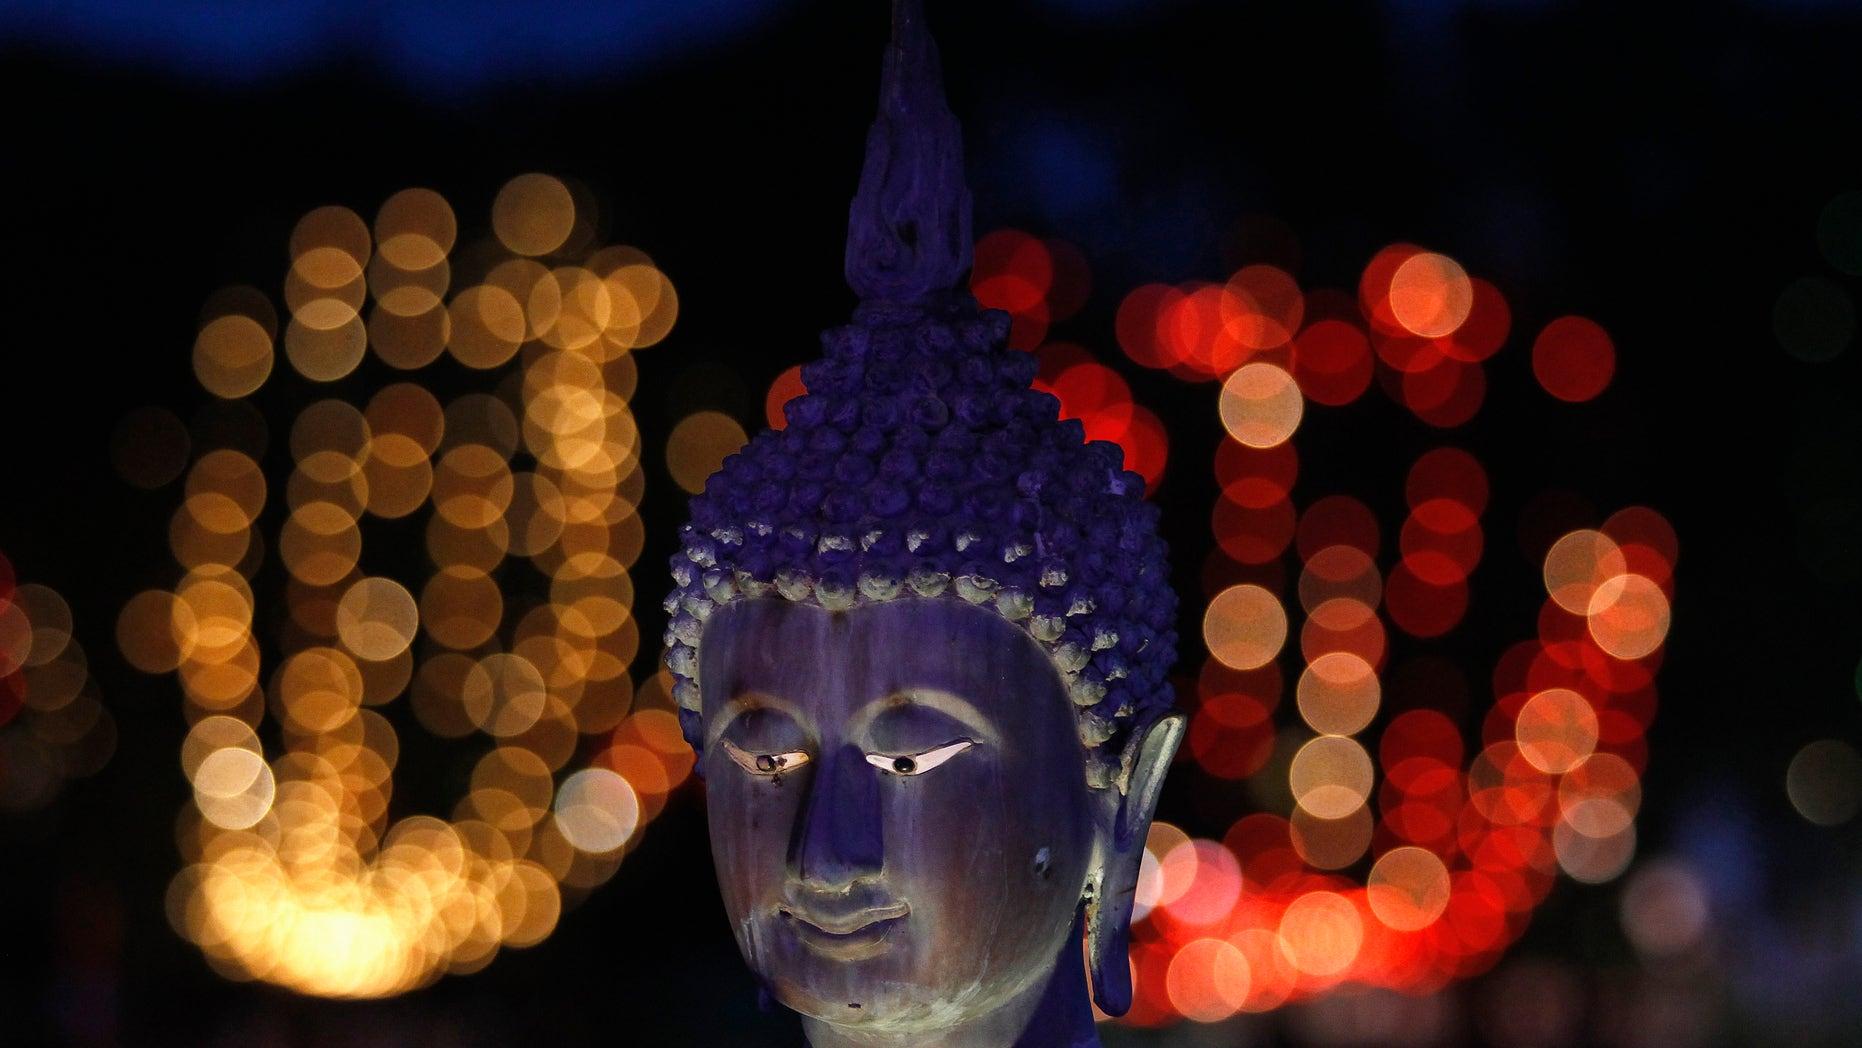 May 26, 2013: A Buddha statue at Gangaramaya Temple in Colombo, Sri Lanka. (Reuters)